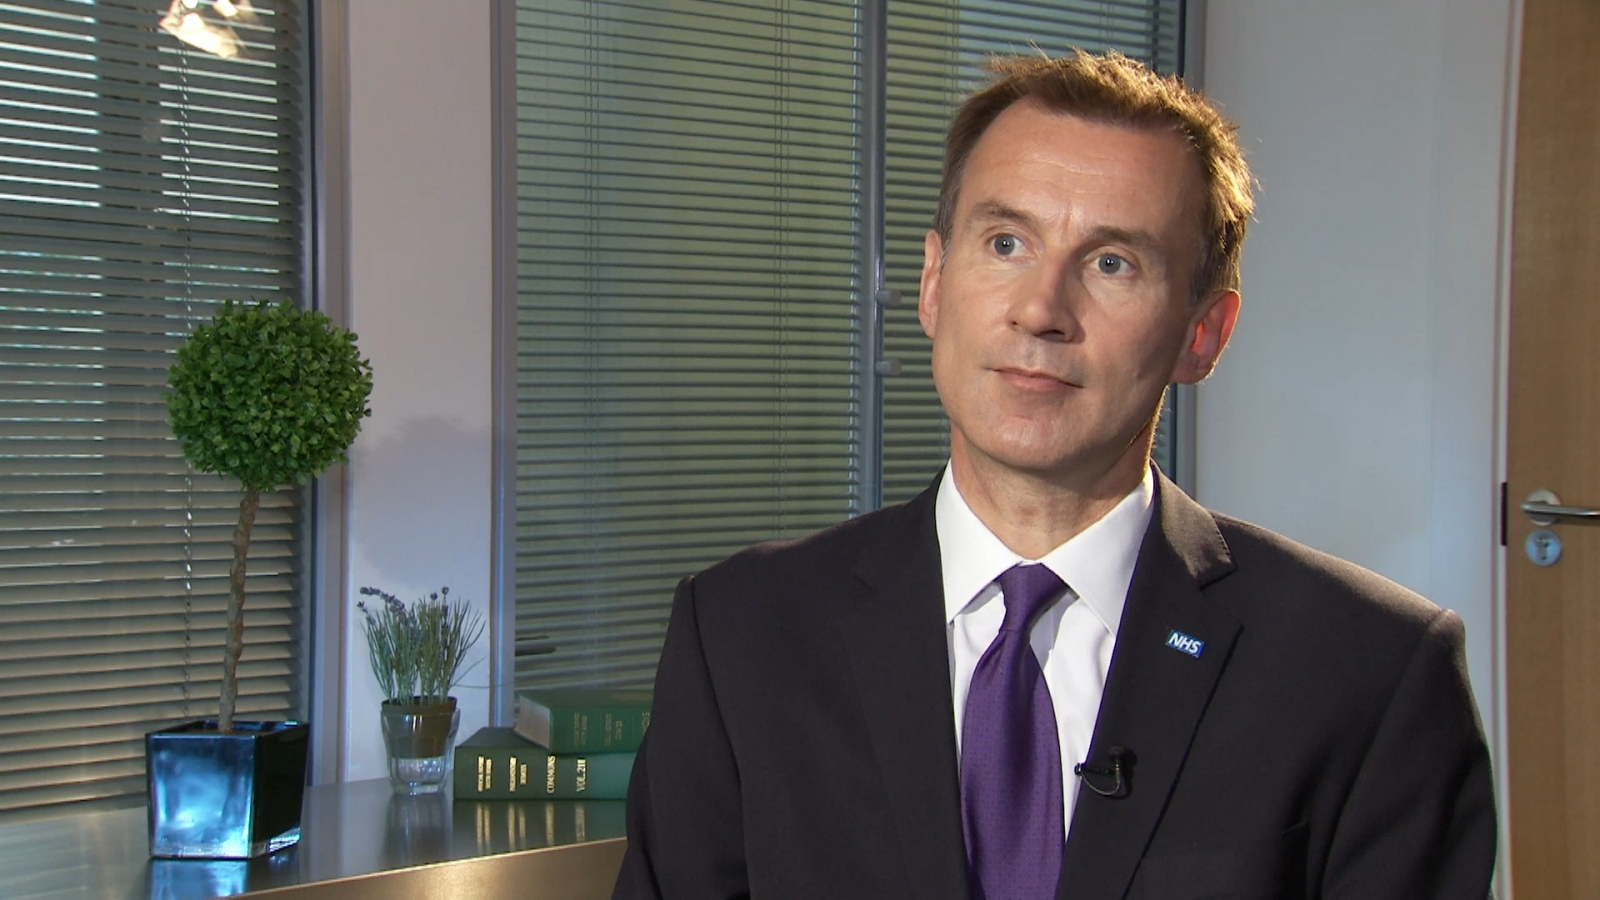 Jeremy Hunt considering leadership bid